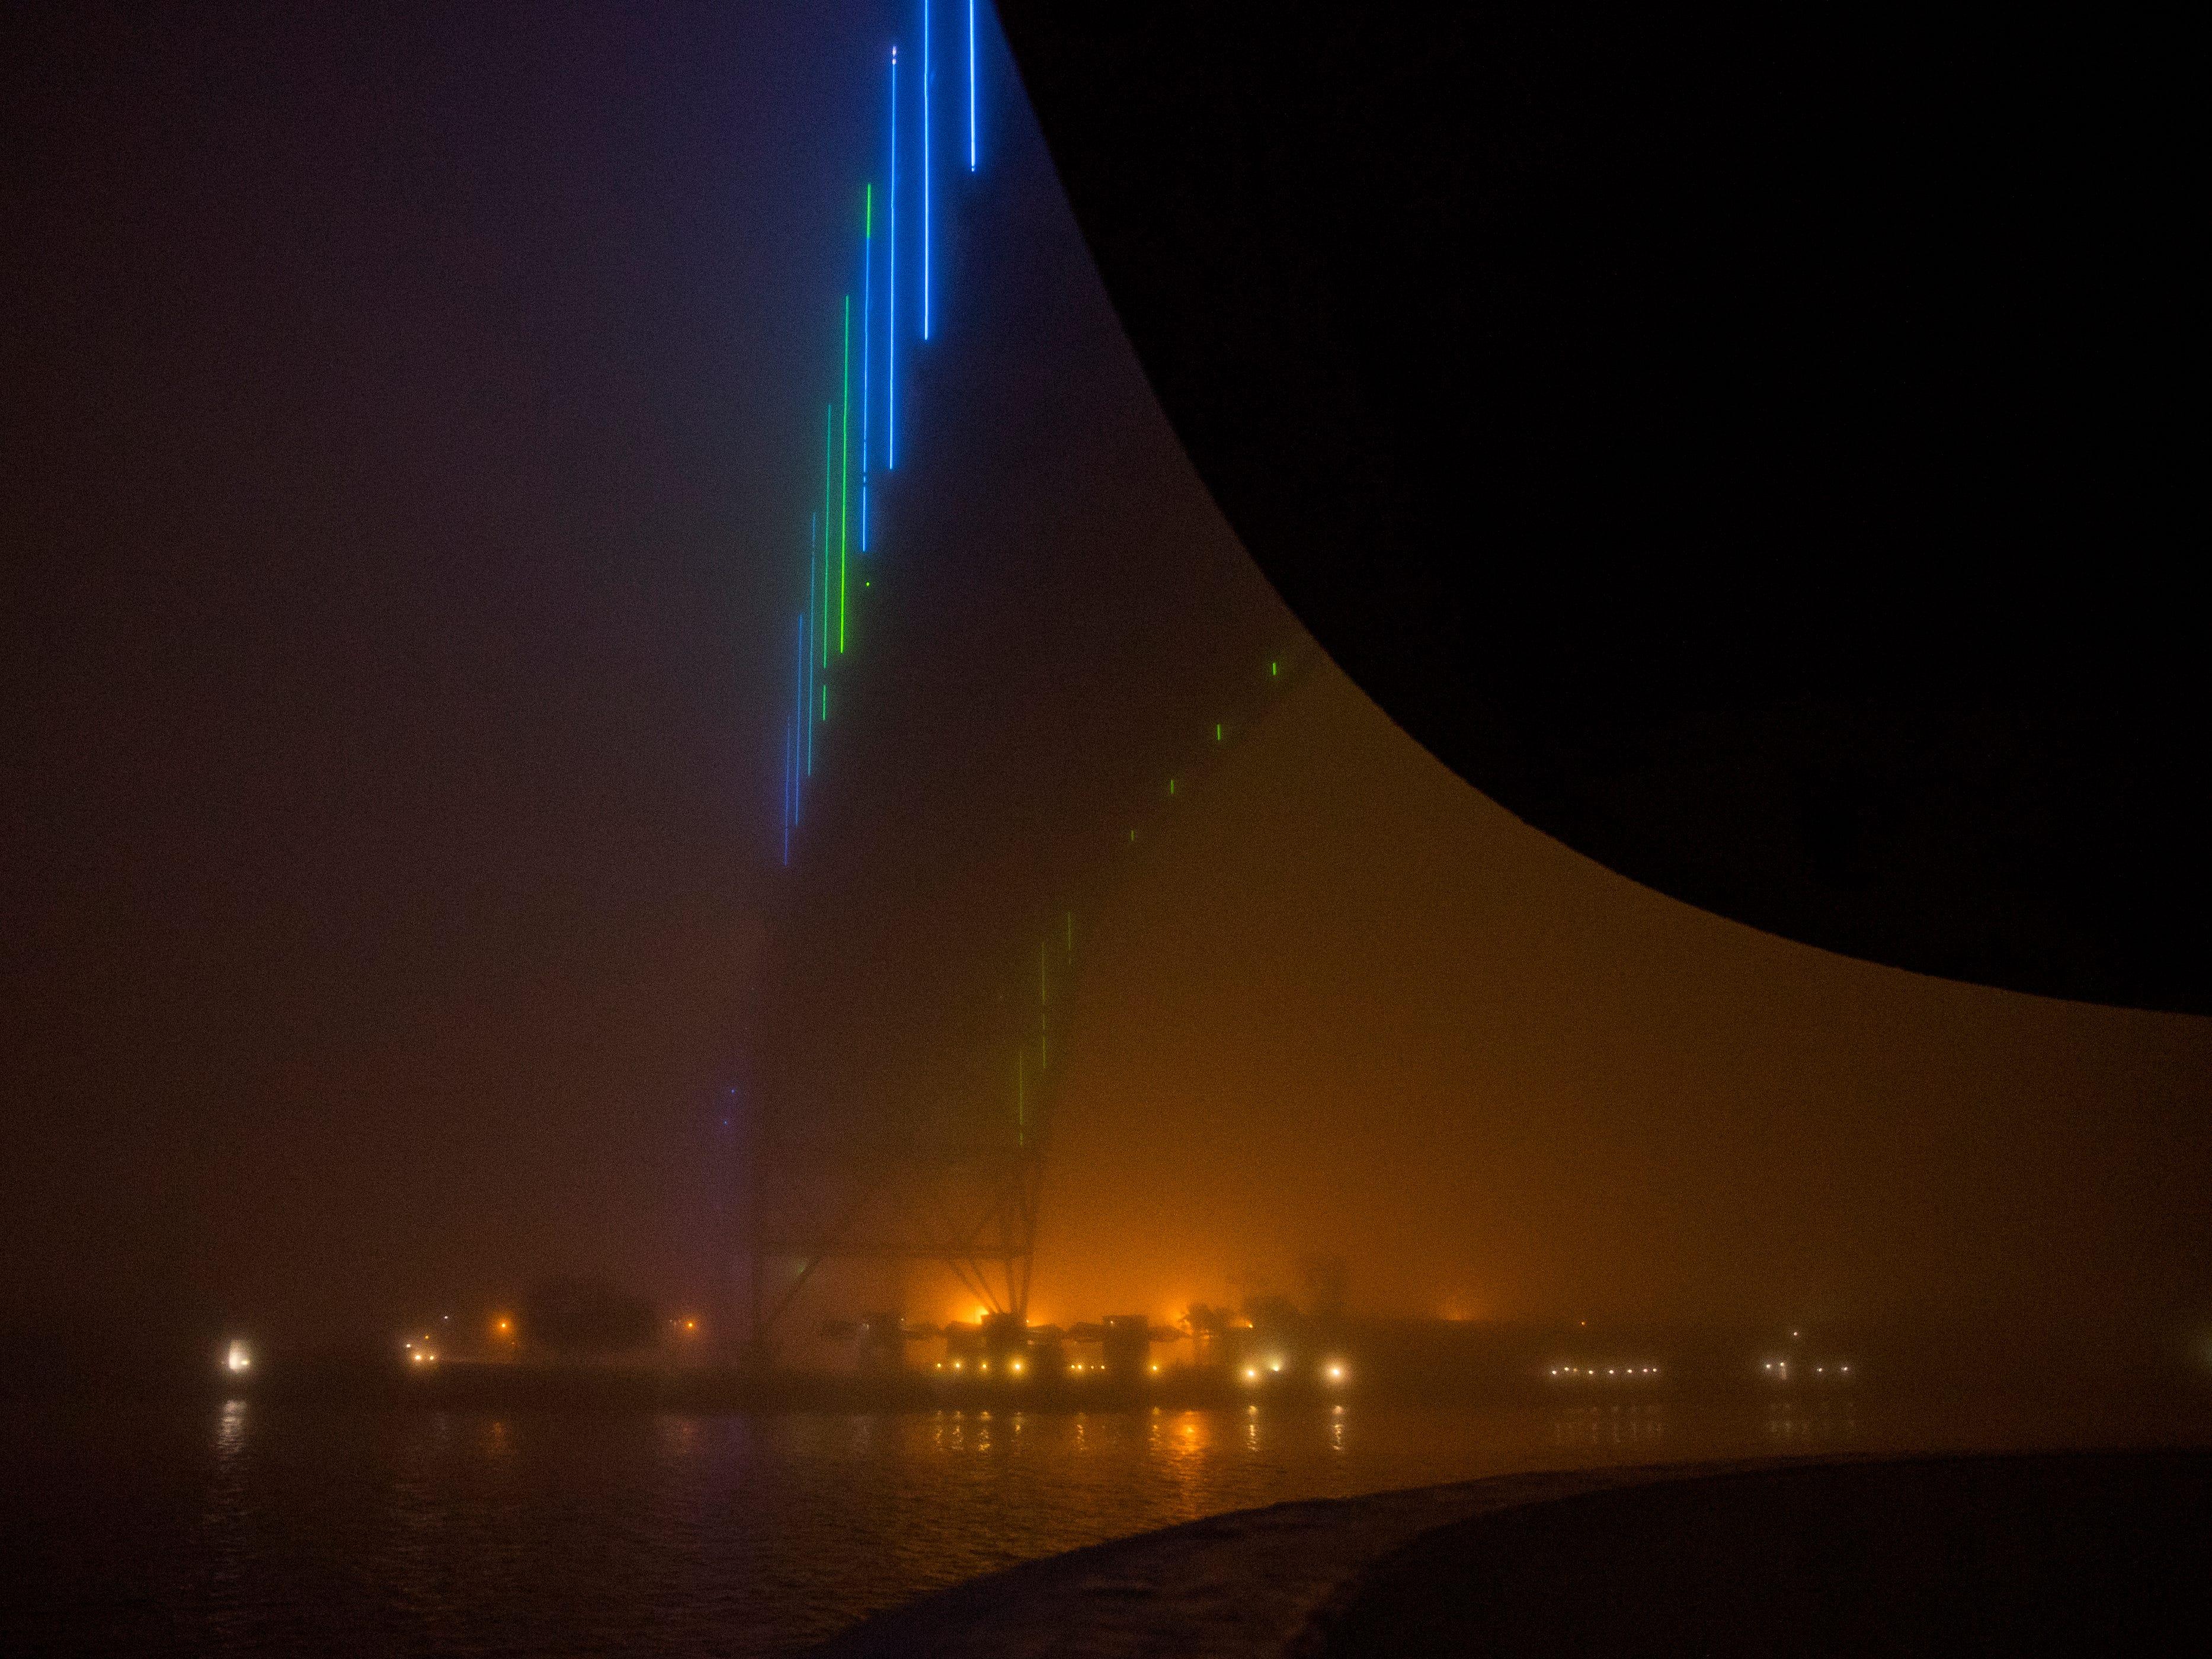 The Harbor Bridge in Corpus Christi was shrouded in fog on Monday, February 4, 2019.